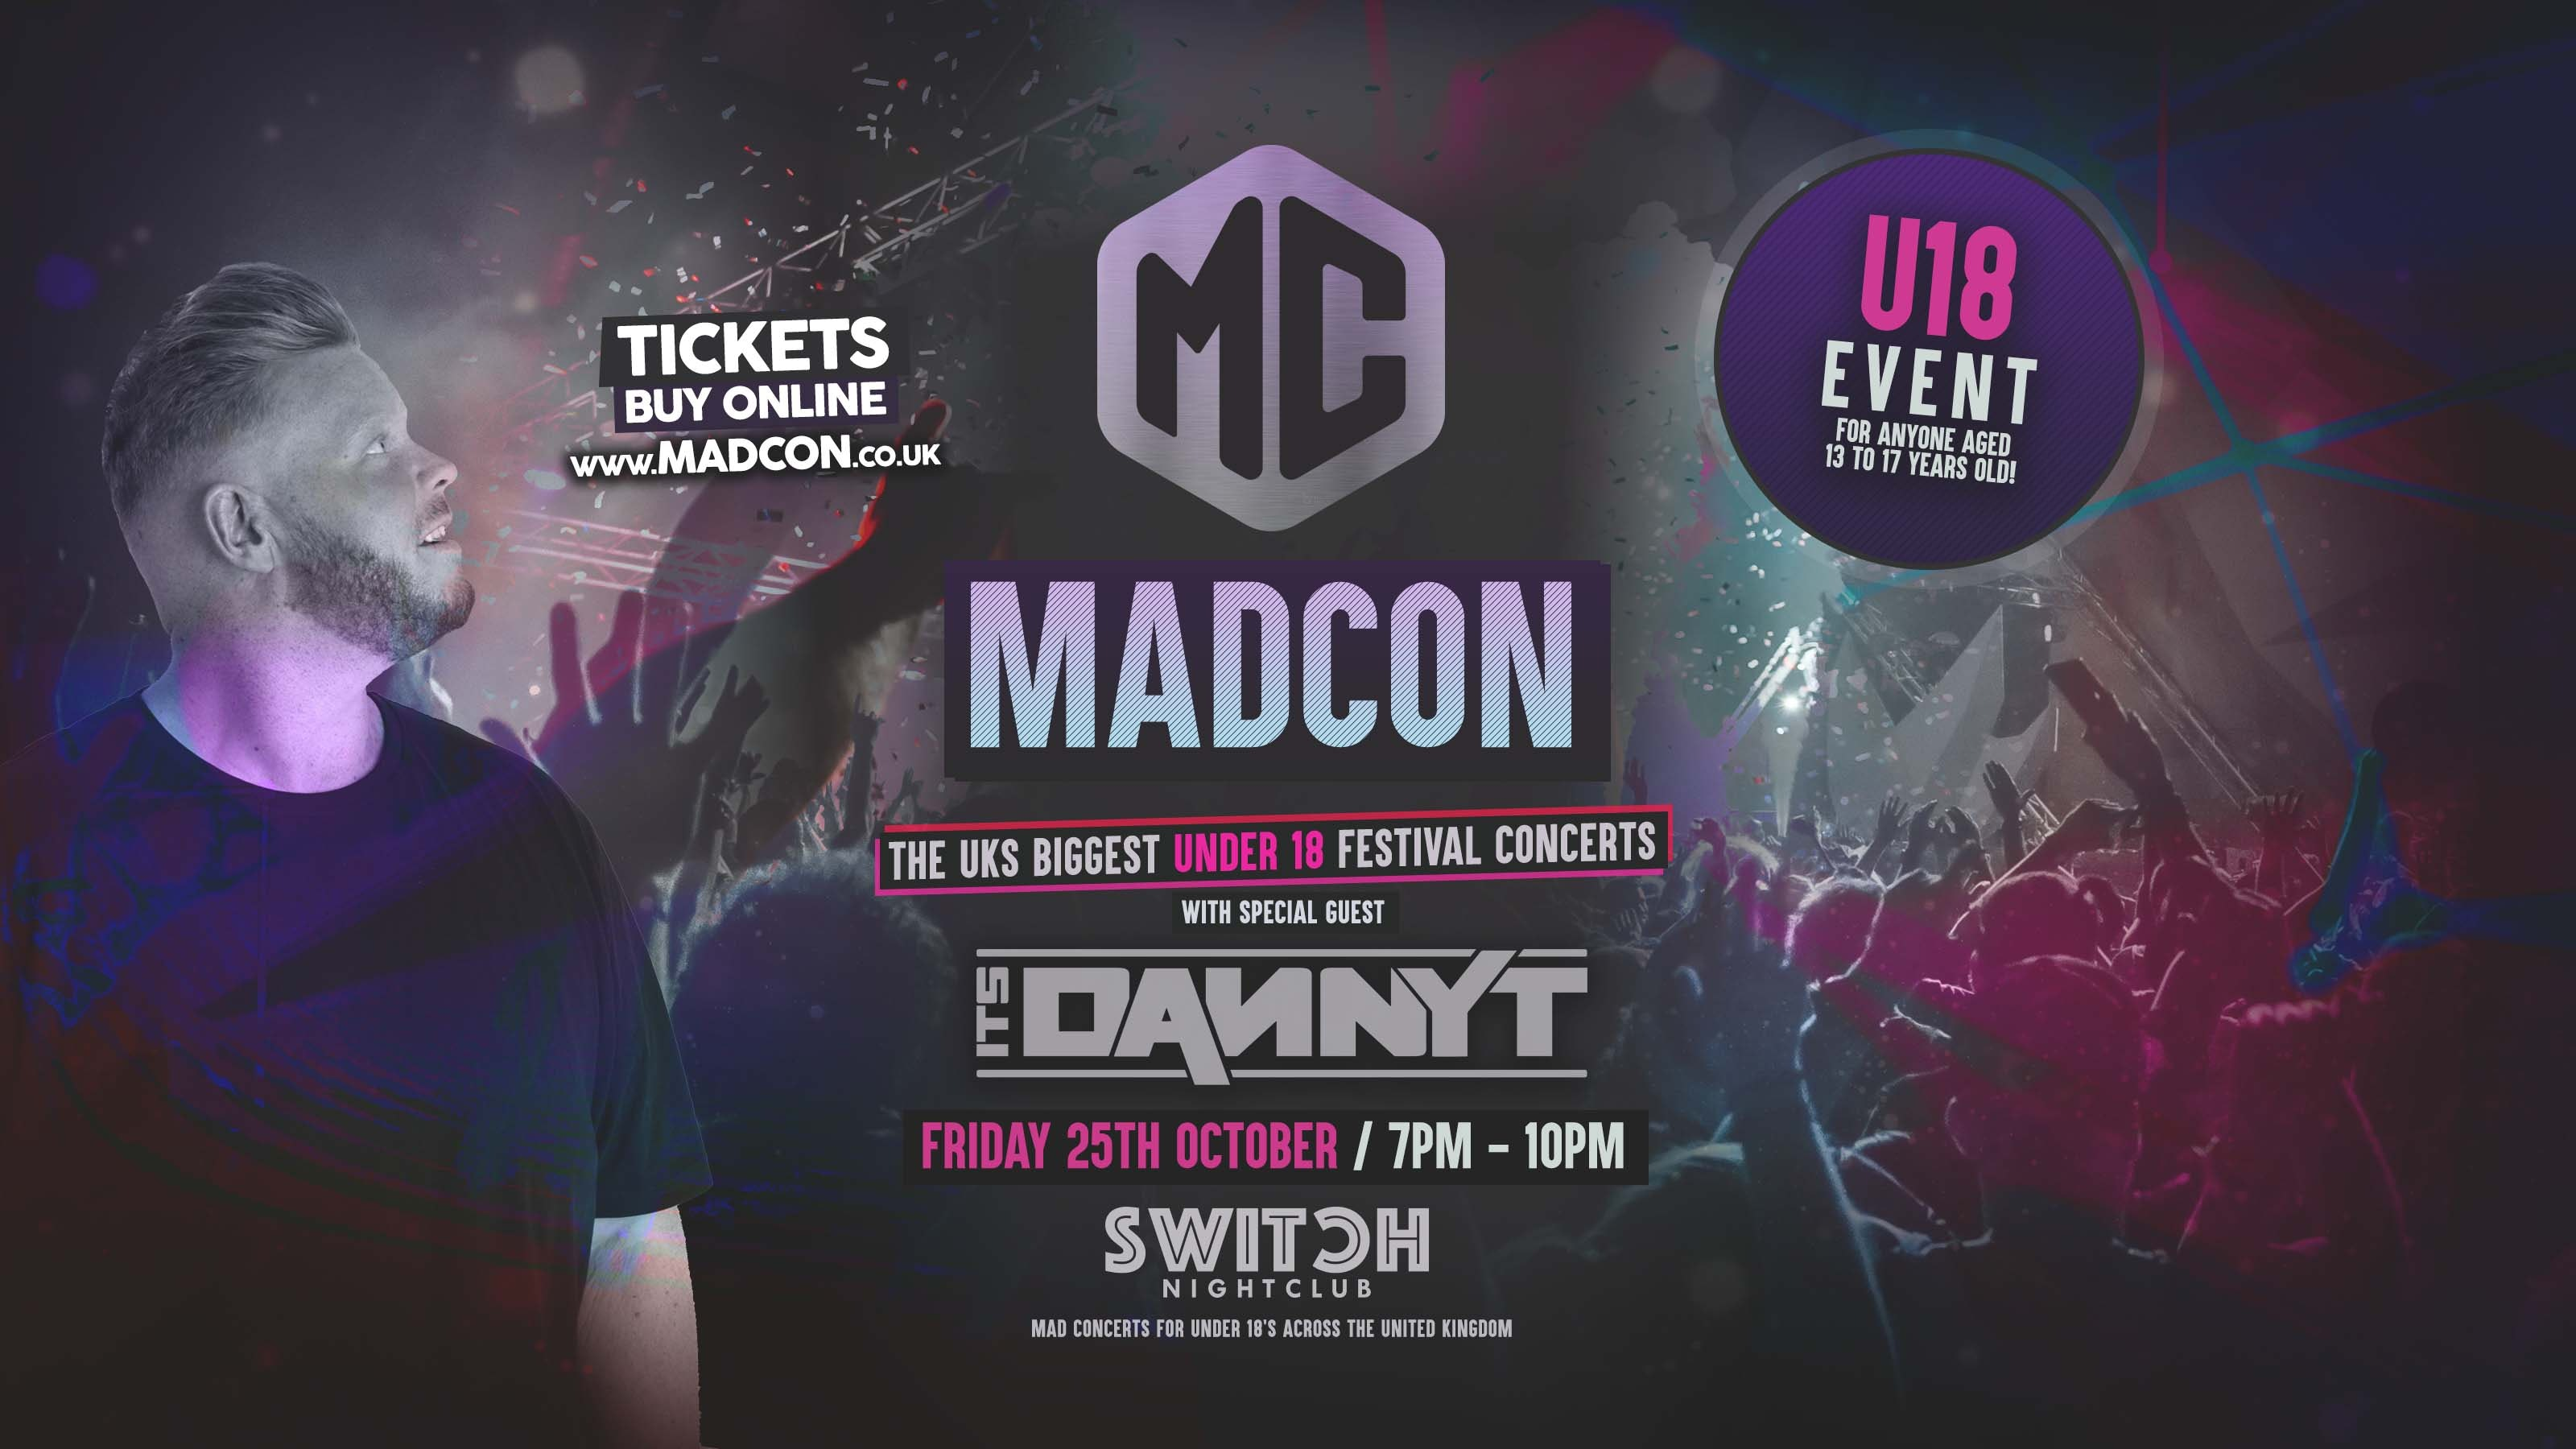 MadCON U18 – Switch Preston